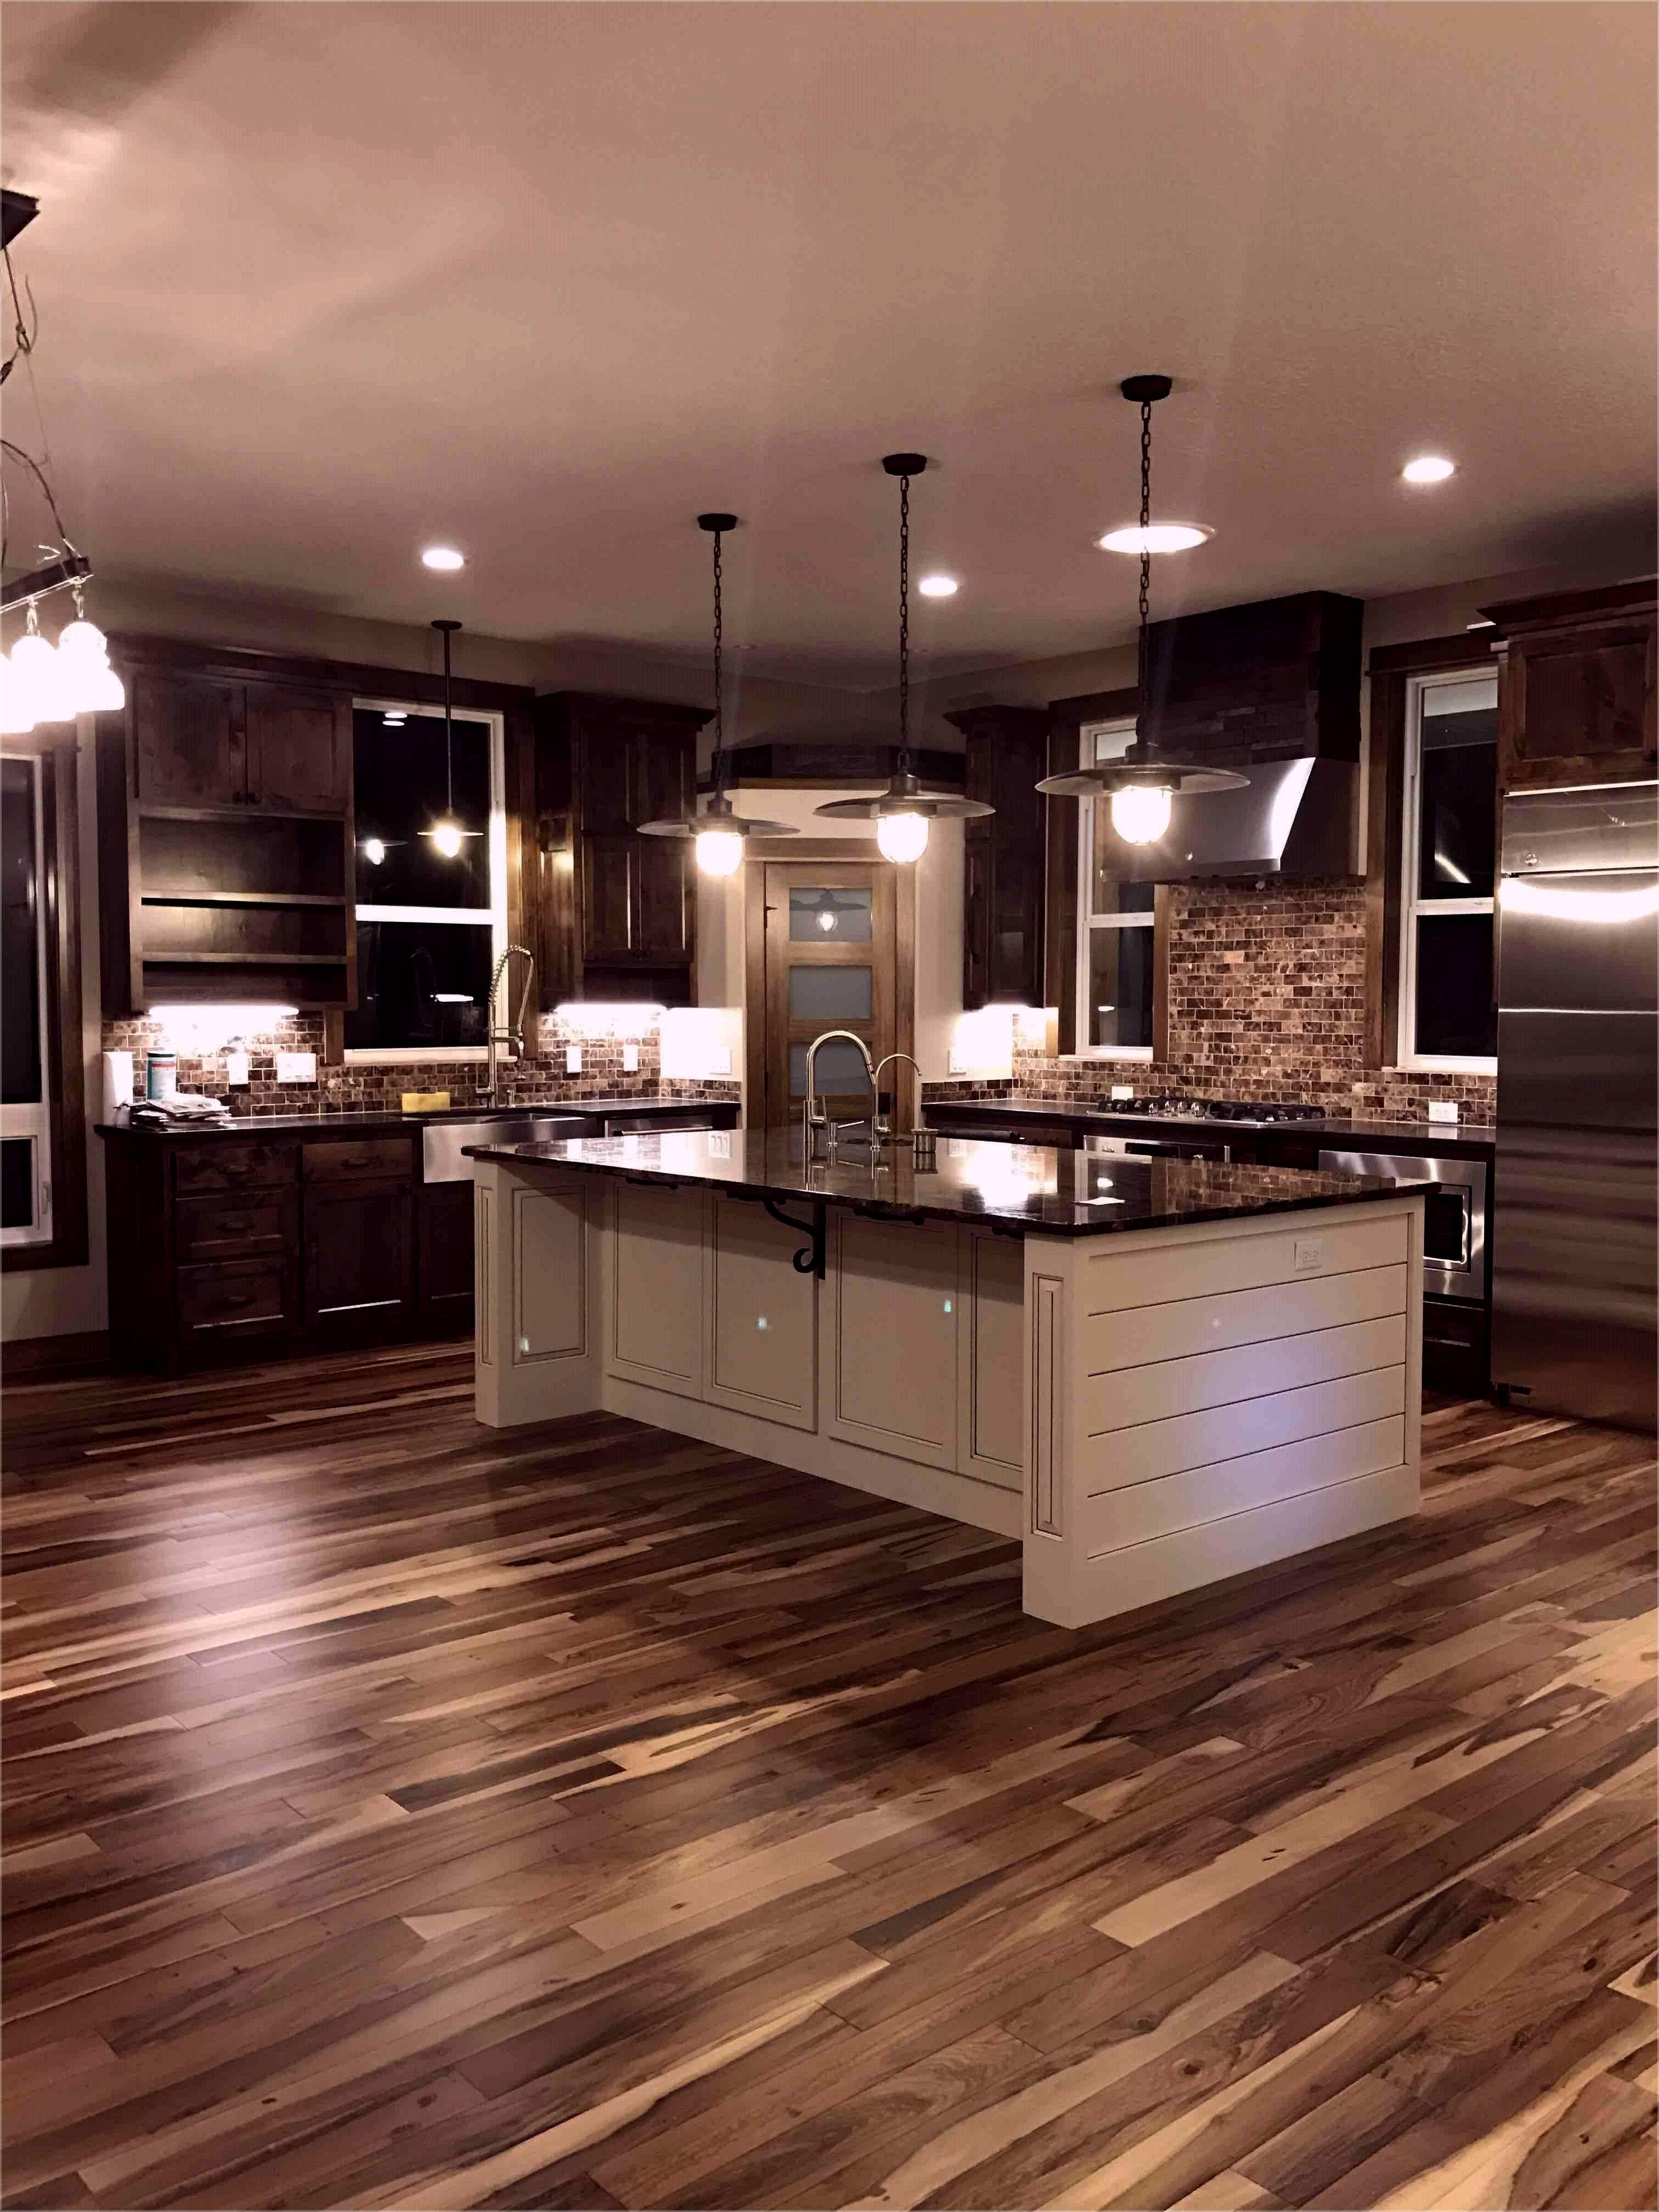 9 Best Kitchen Decor Design or Remodel Ideas that Will Inspire ...